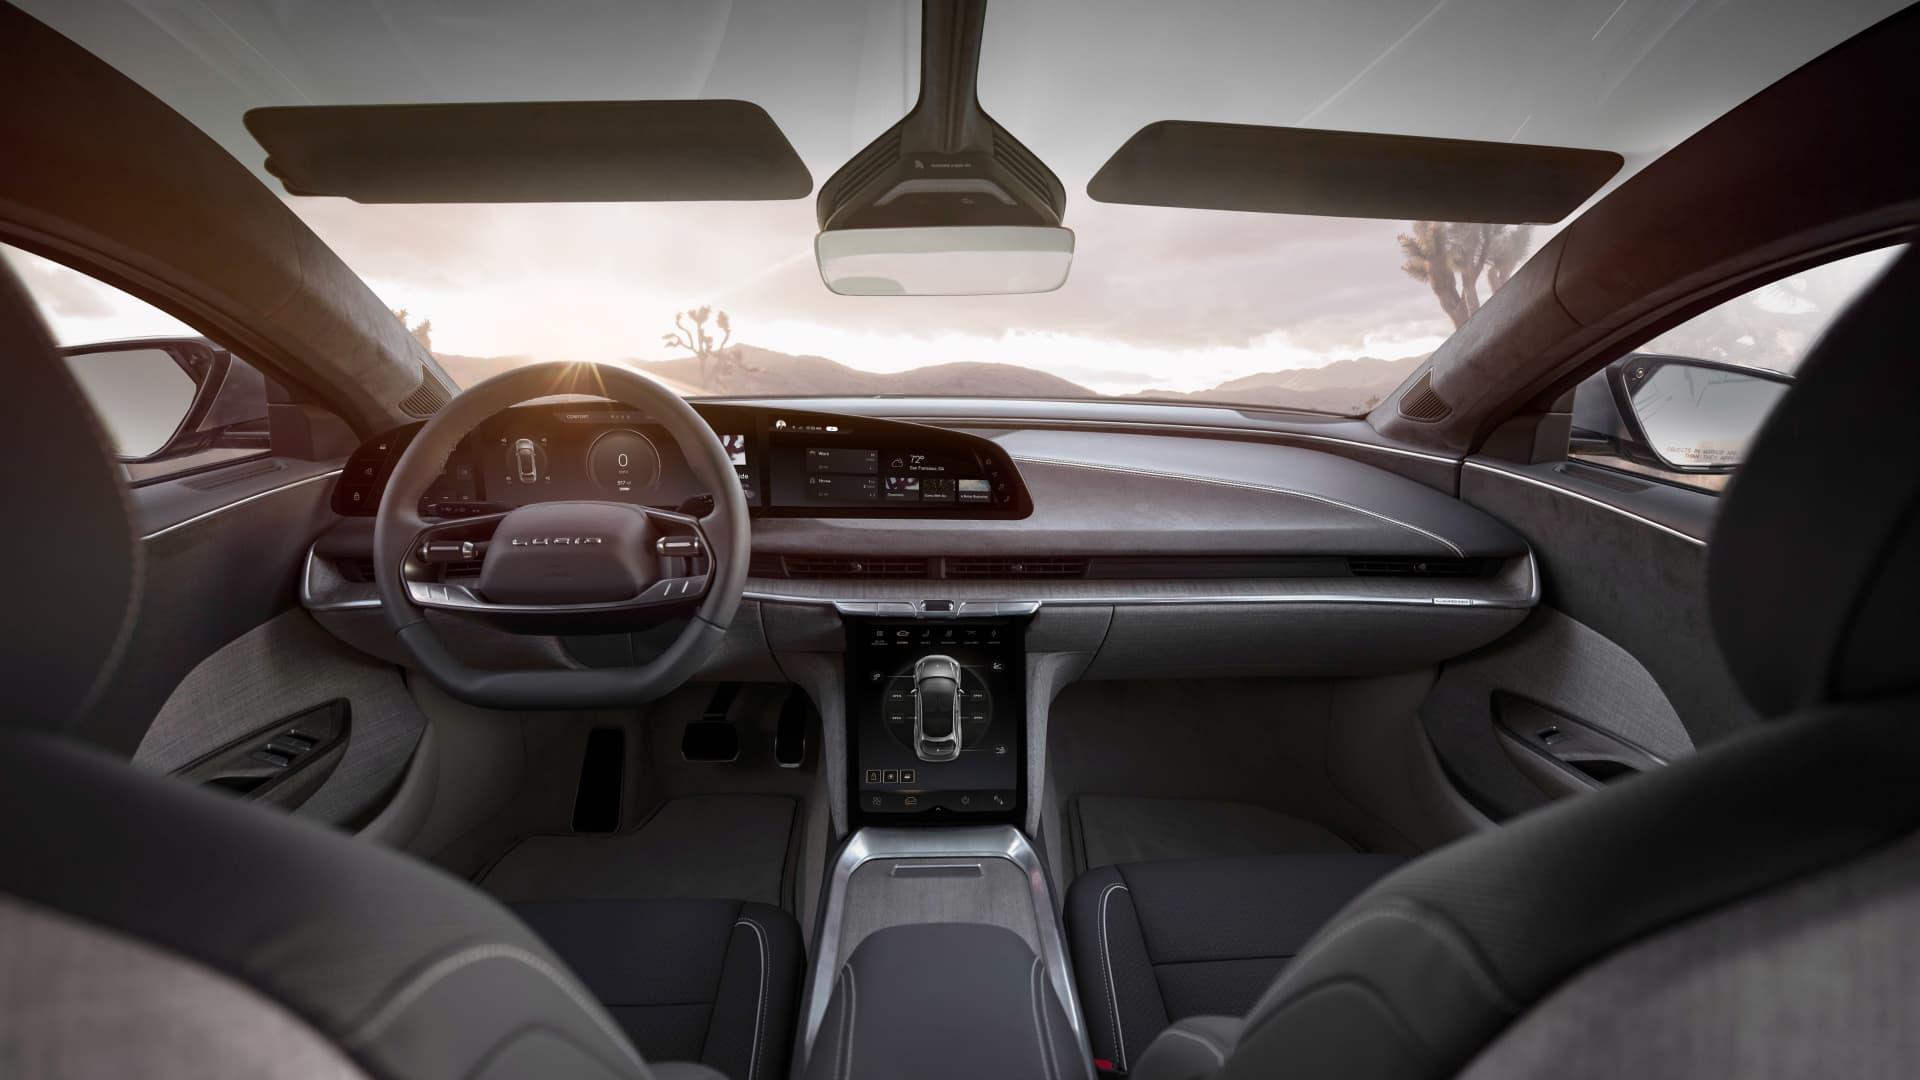 Interior of the Lucid Air sedan.